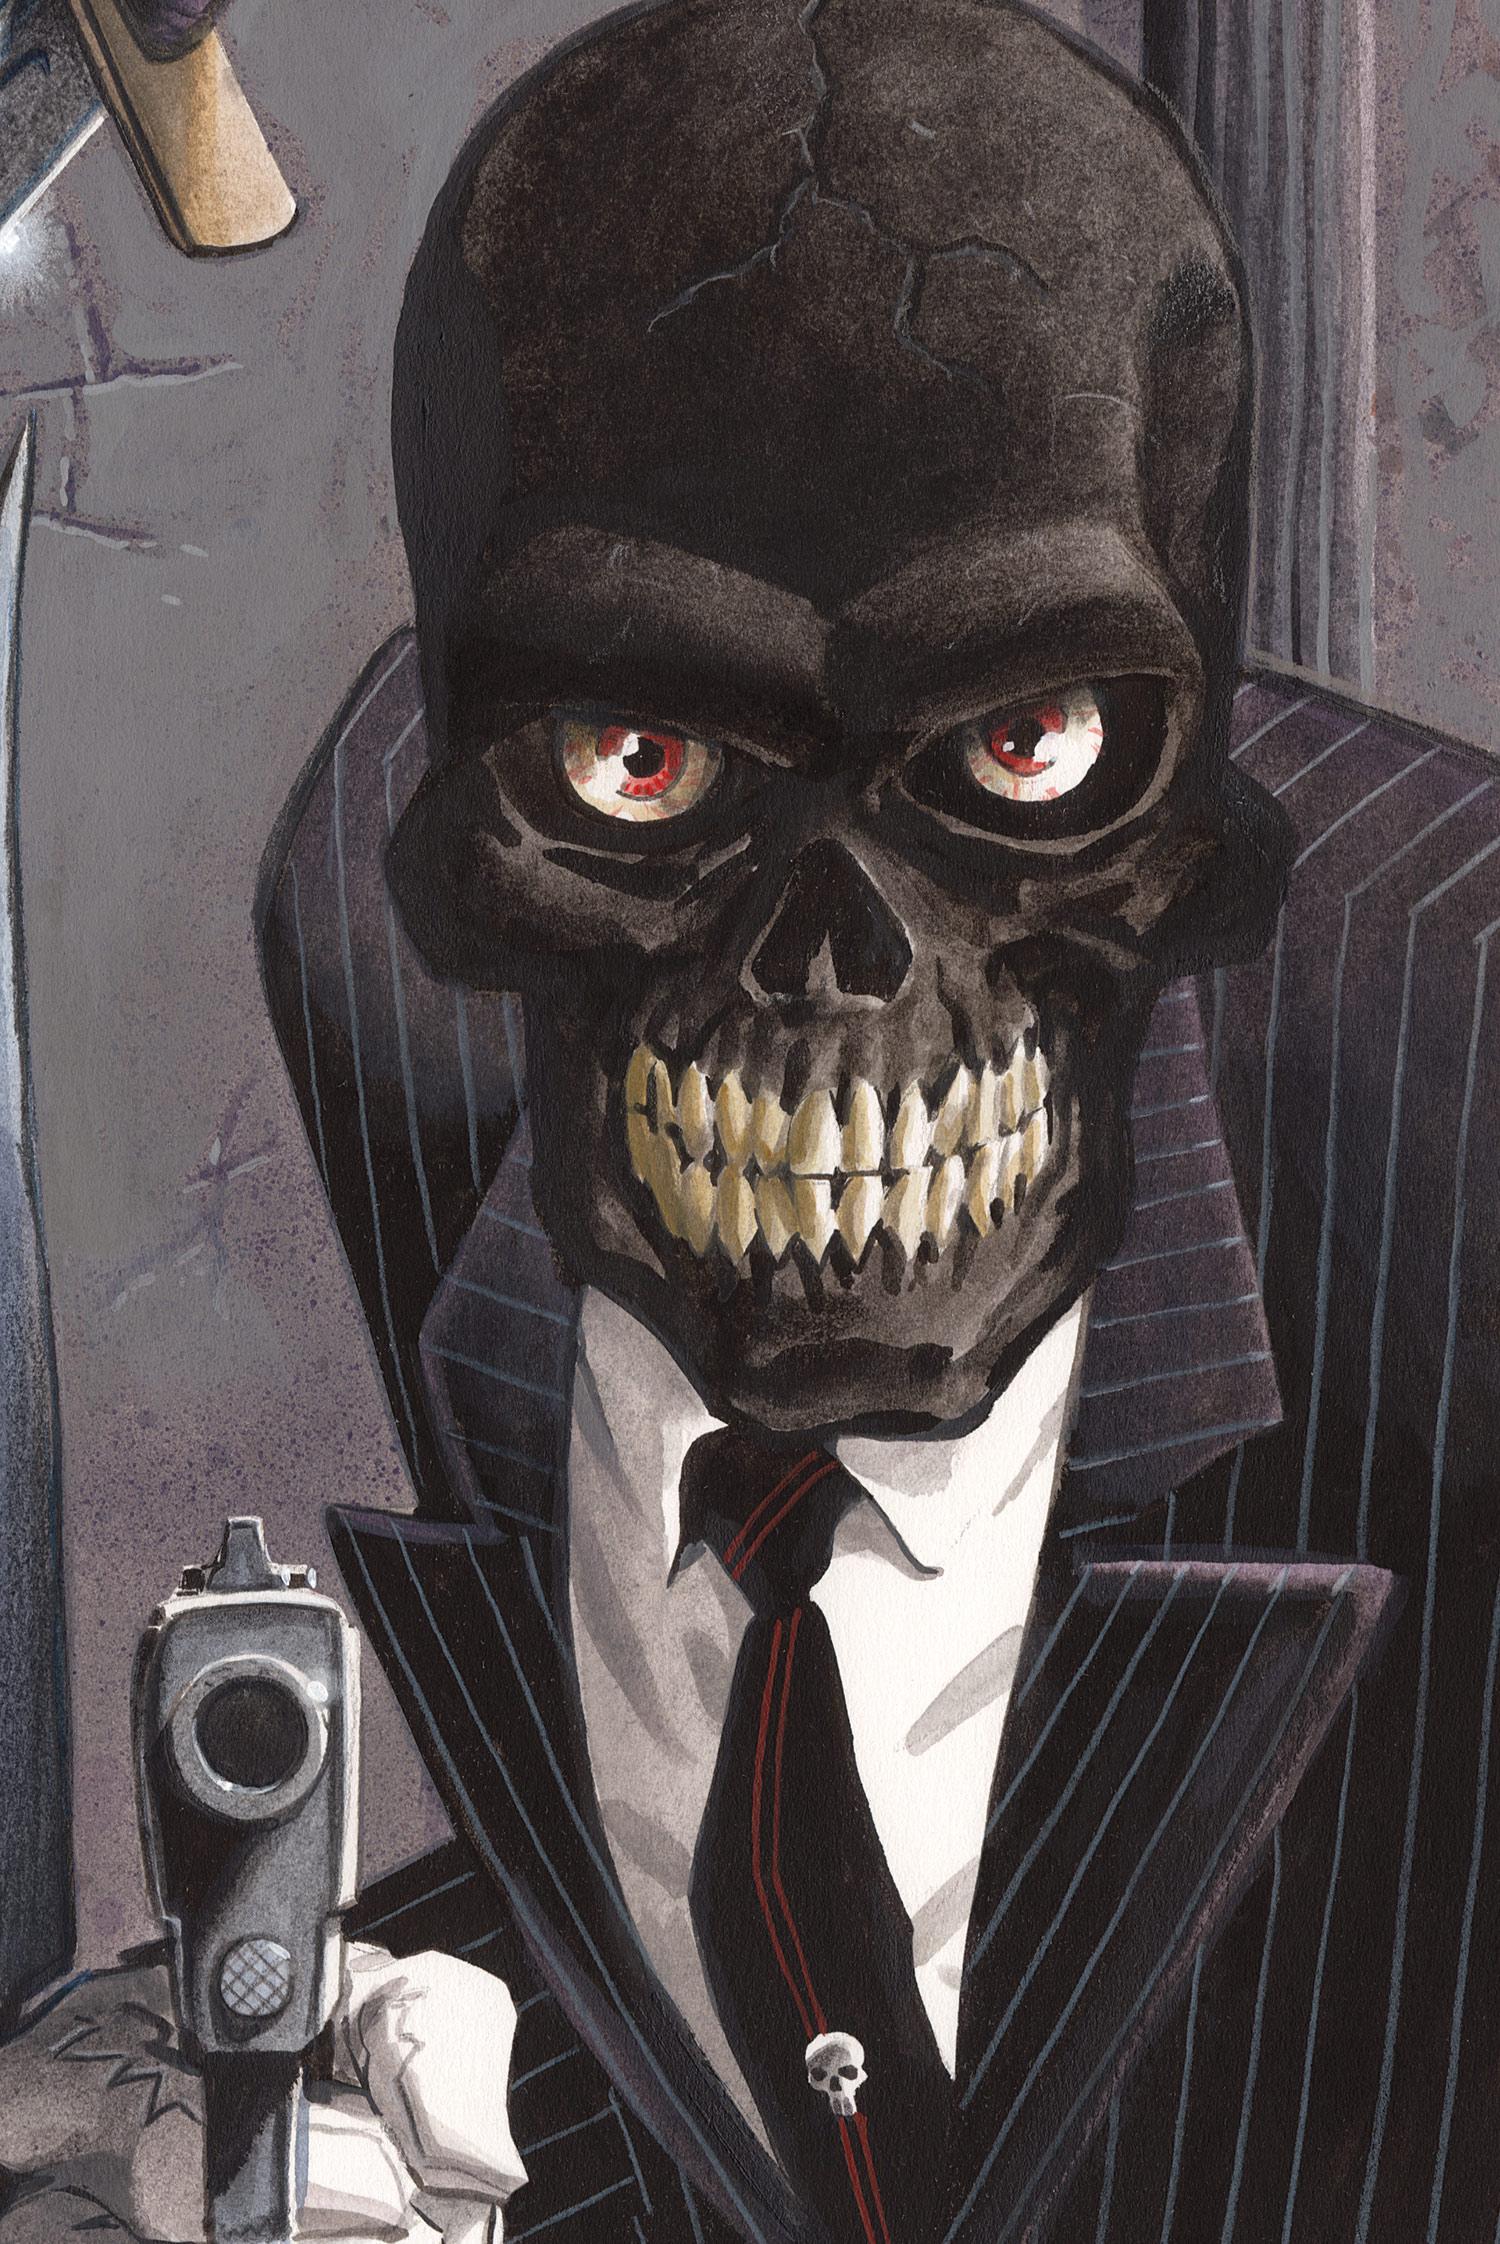 blackmask-profile-Batman_2005_636_Cover-Textless-v1-1500x2244-masthead.jpg